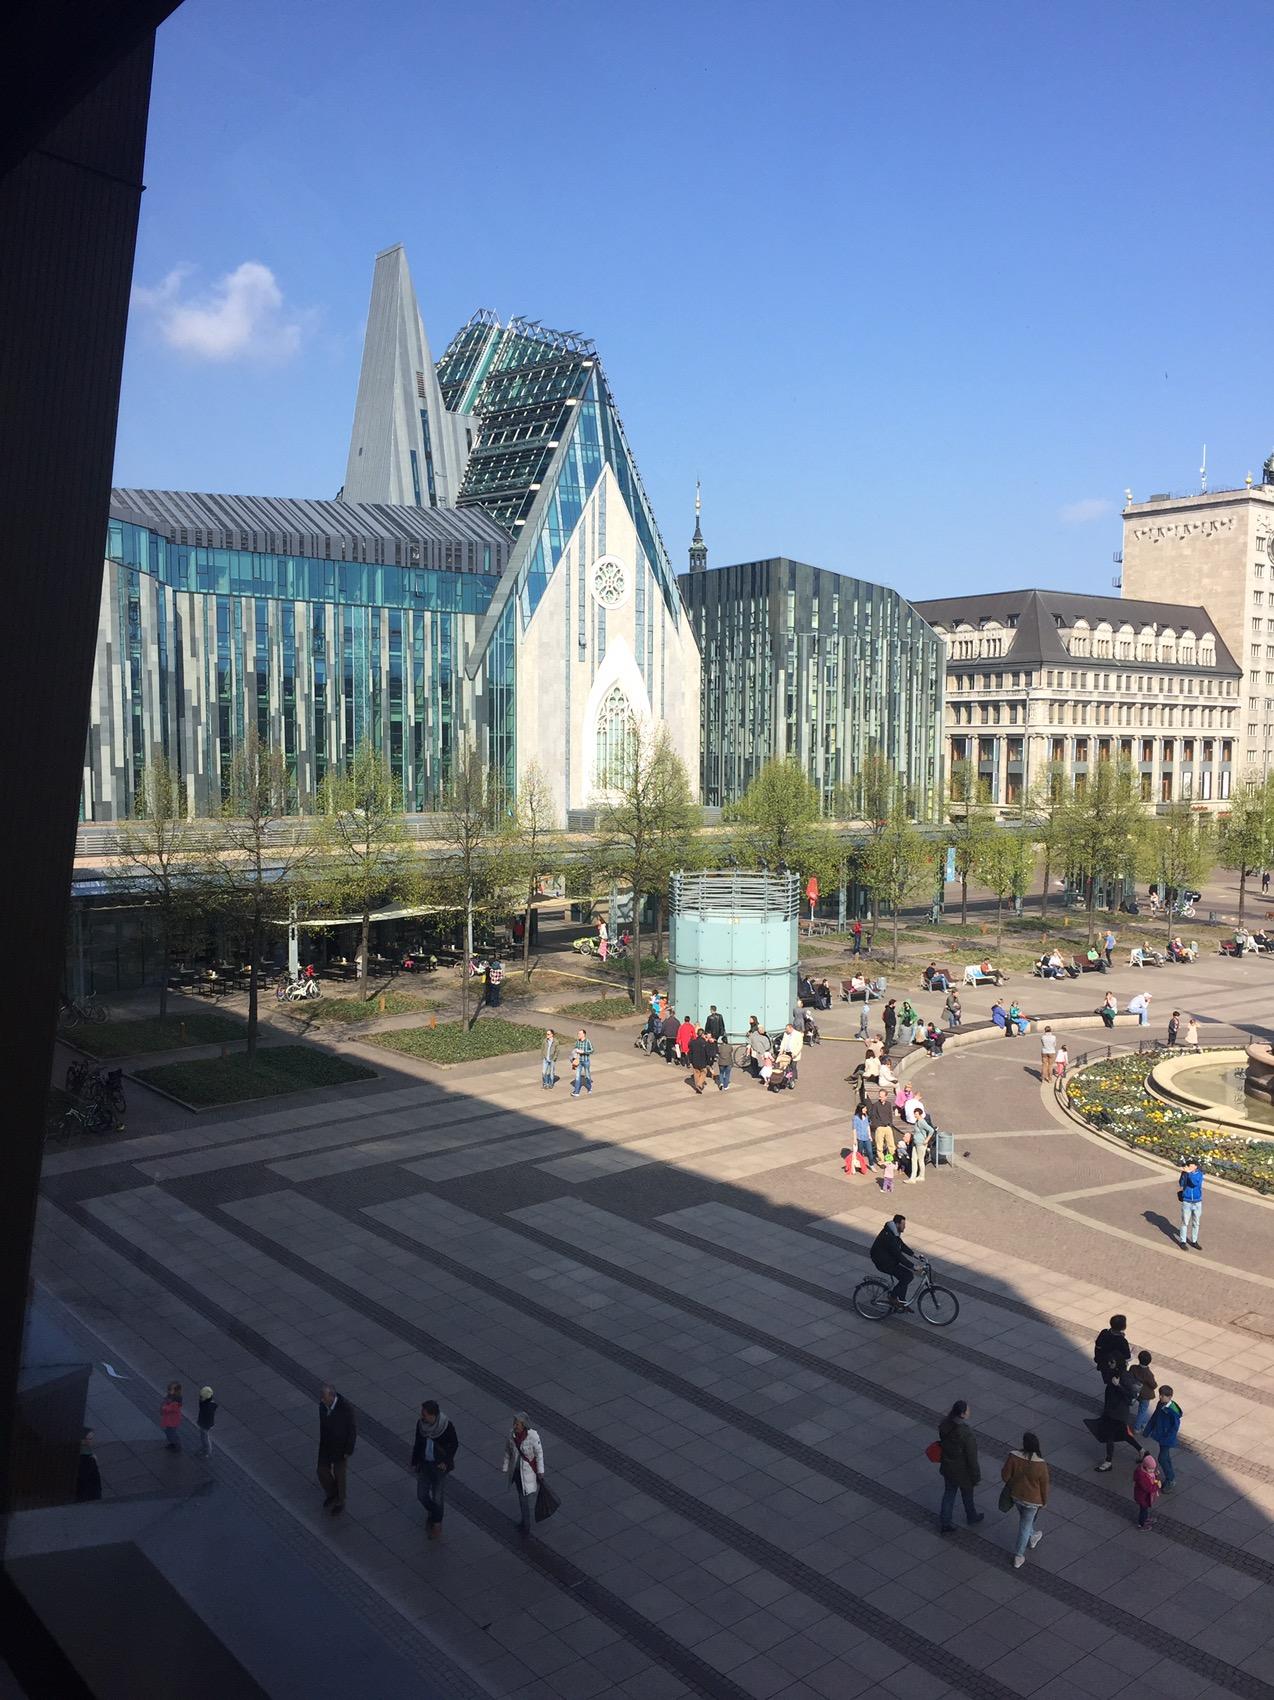 Universitätscampus, Blick auf das Augusteum und das Paulinum